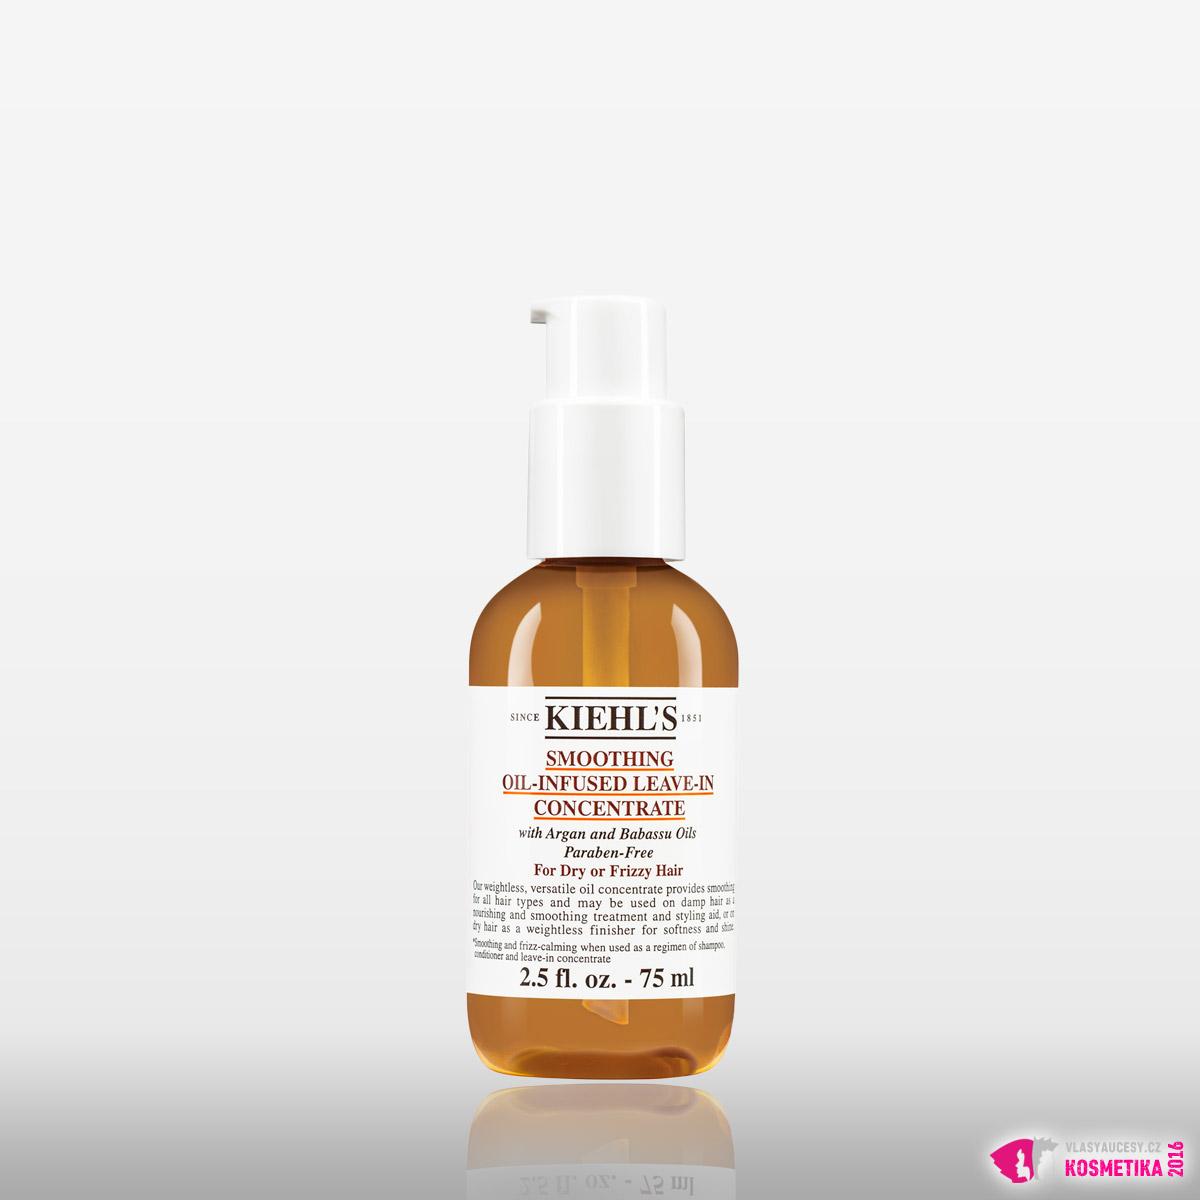 Bezoplachová péče pro suché vlasy Kiehl's Smoothing Oil-Infused Leave-In Concentrate.